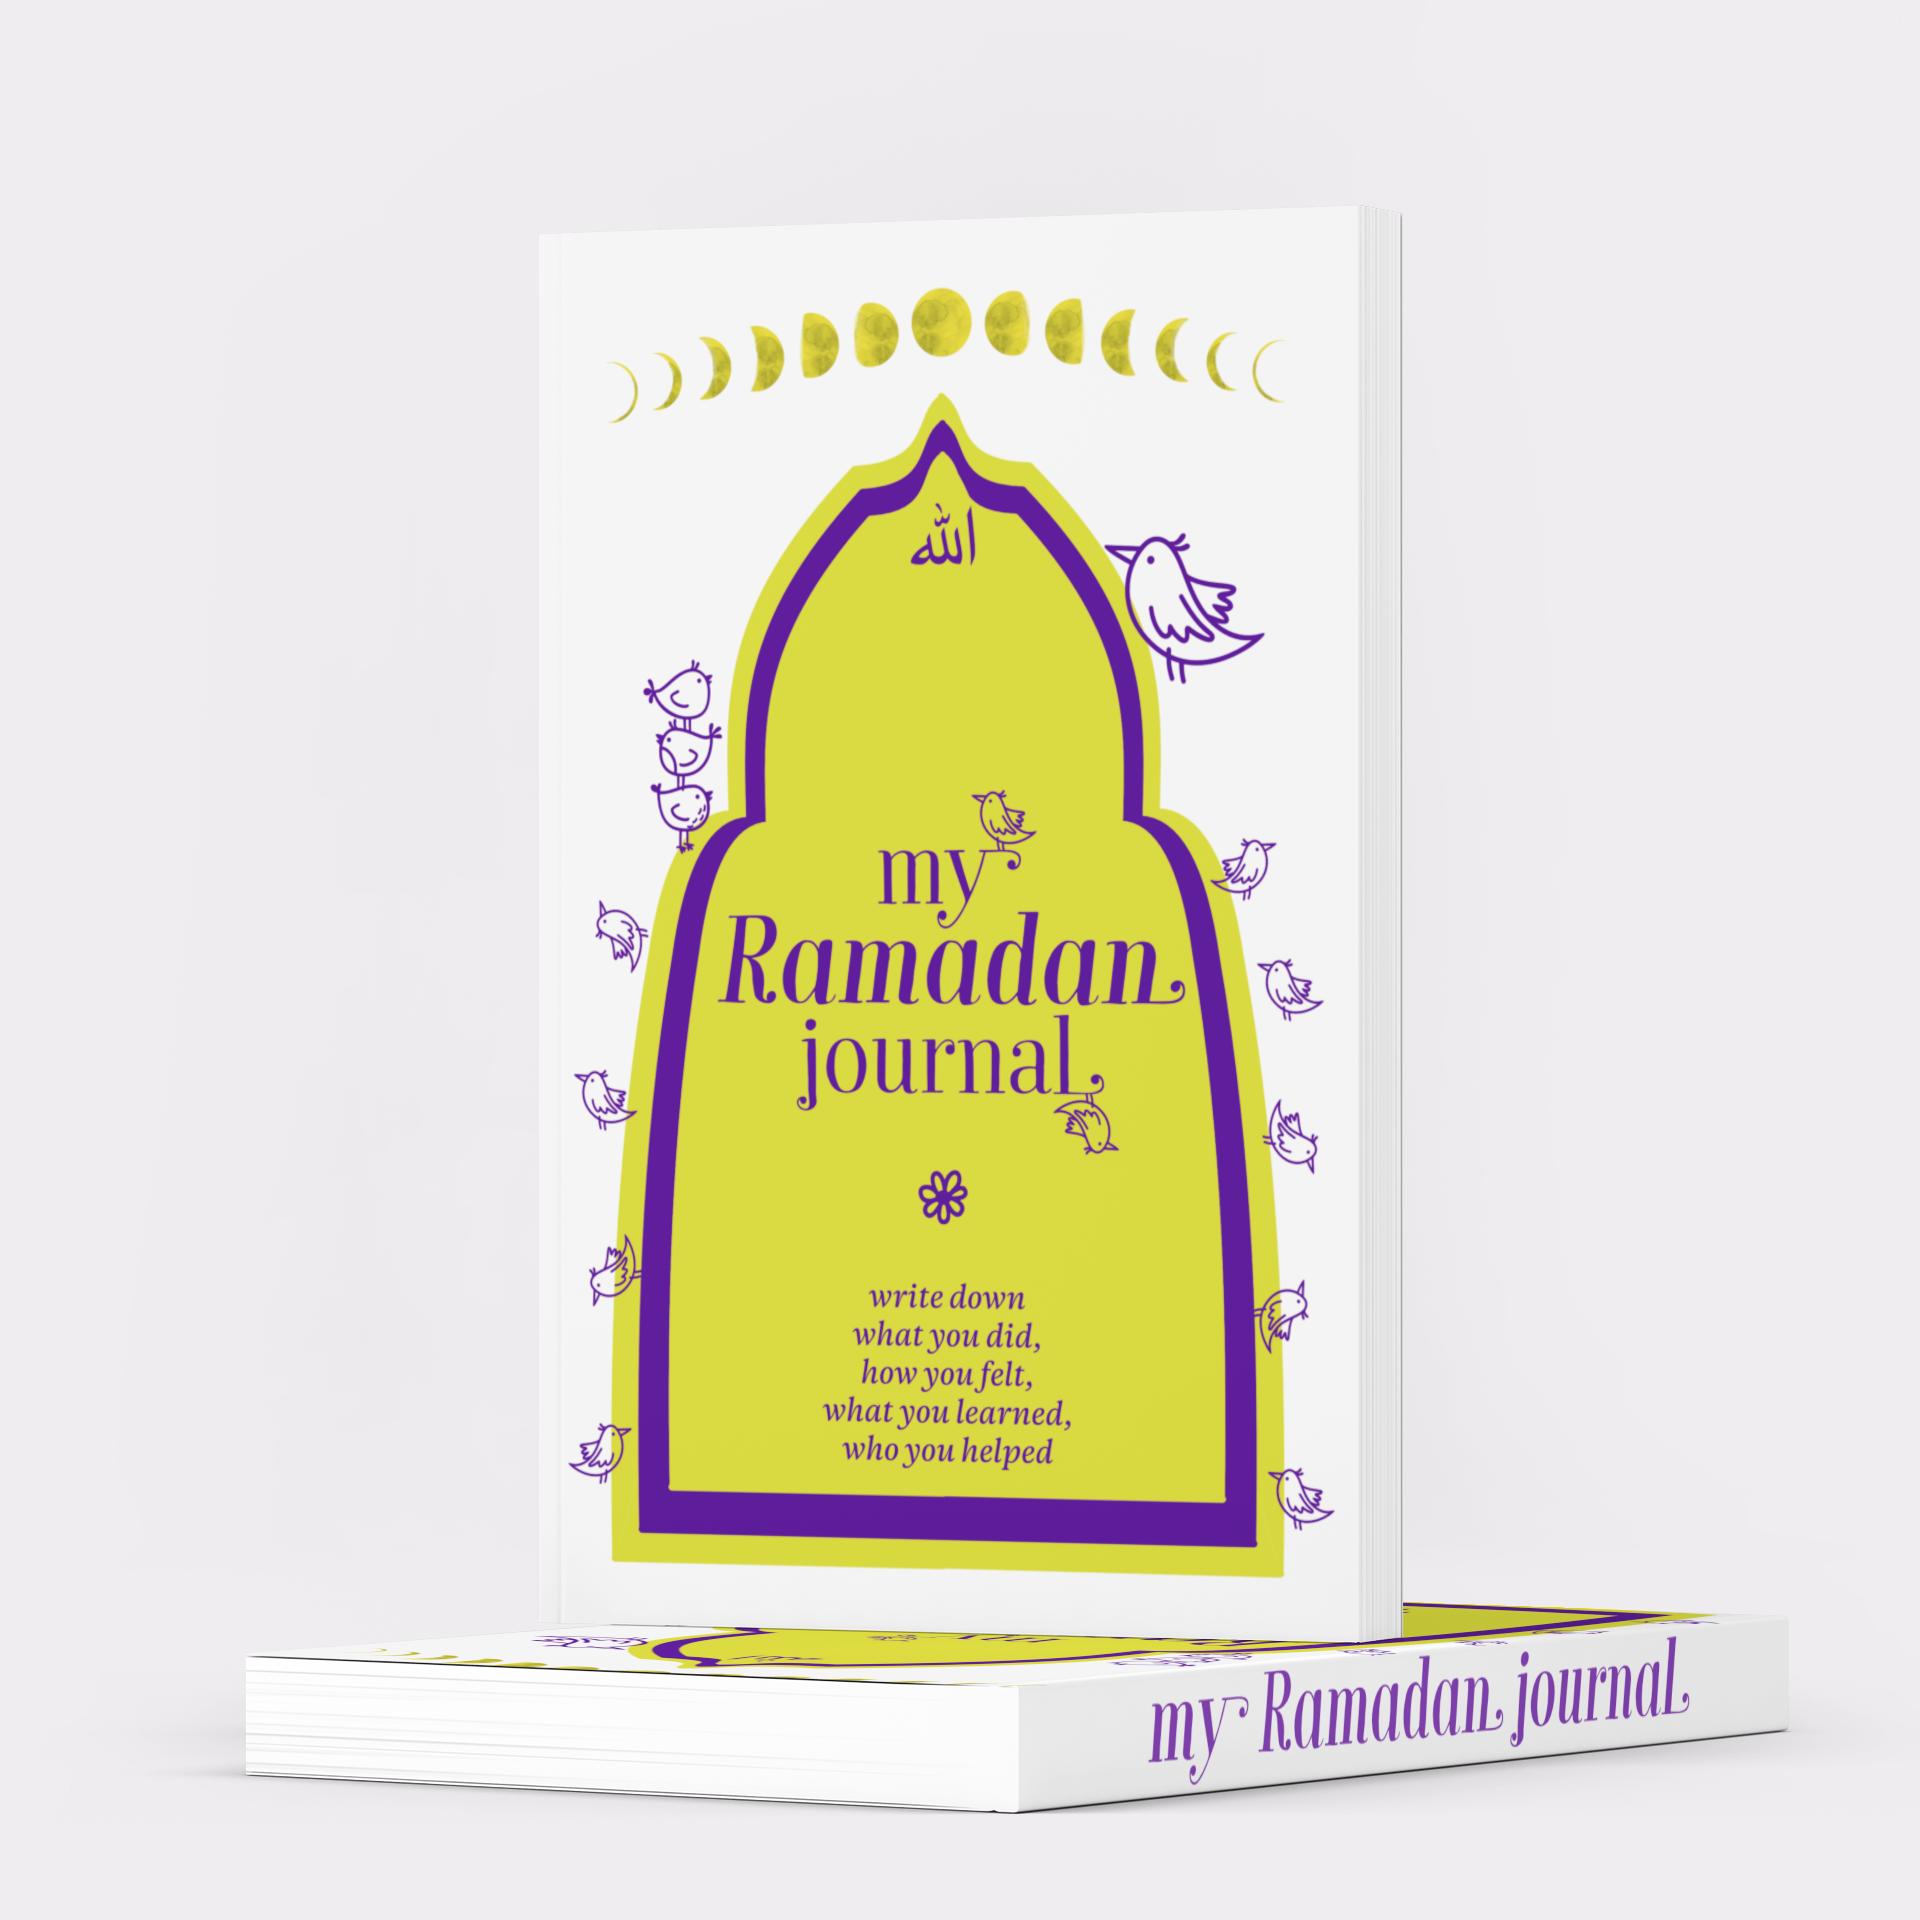 My Ramadan Journal